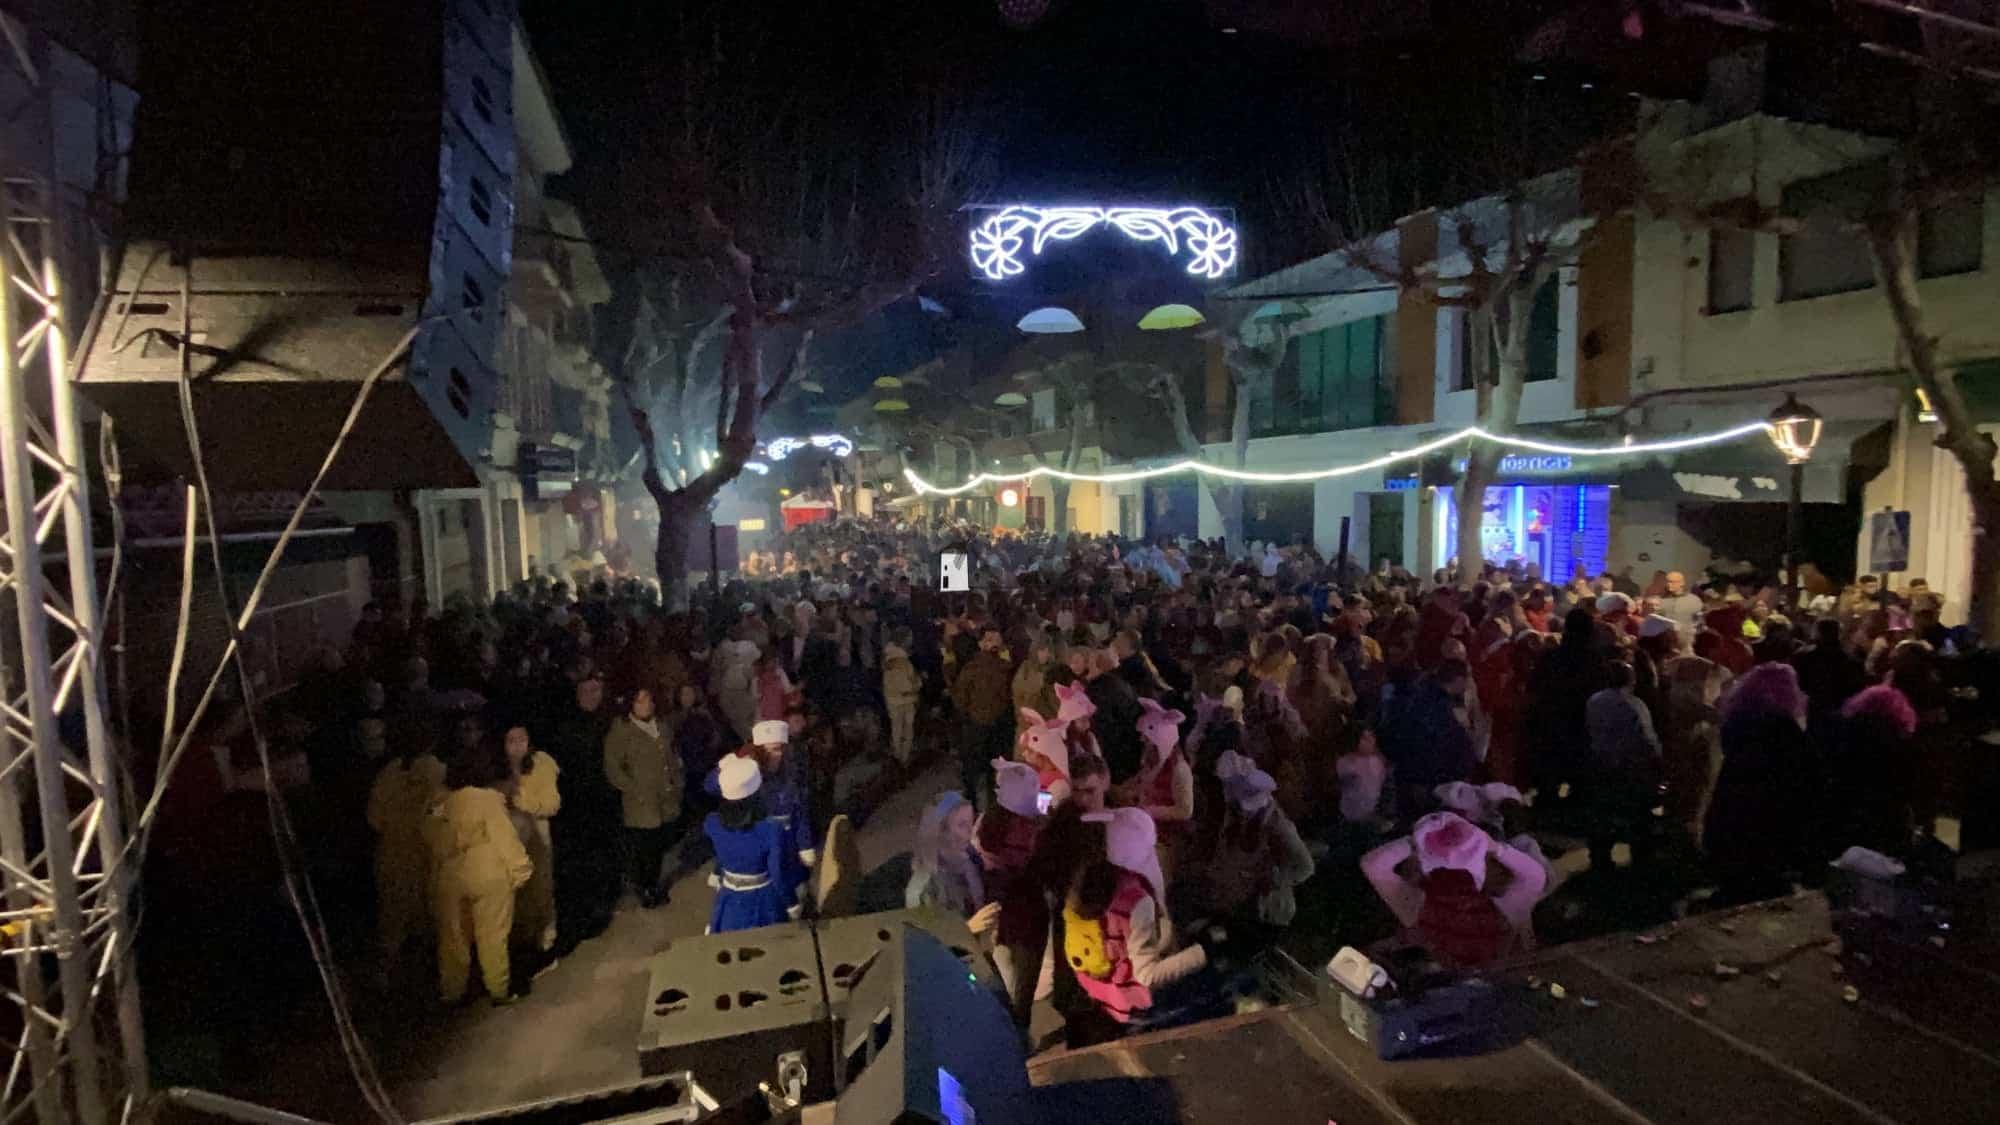 Carnaval de herencia 2019 sabados ansiosos 10 - Inaugurado el Carnaval de Herencia 2020 con el Sábado de los Ansiosos